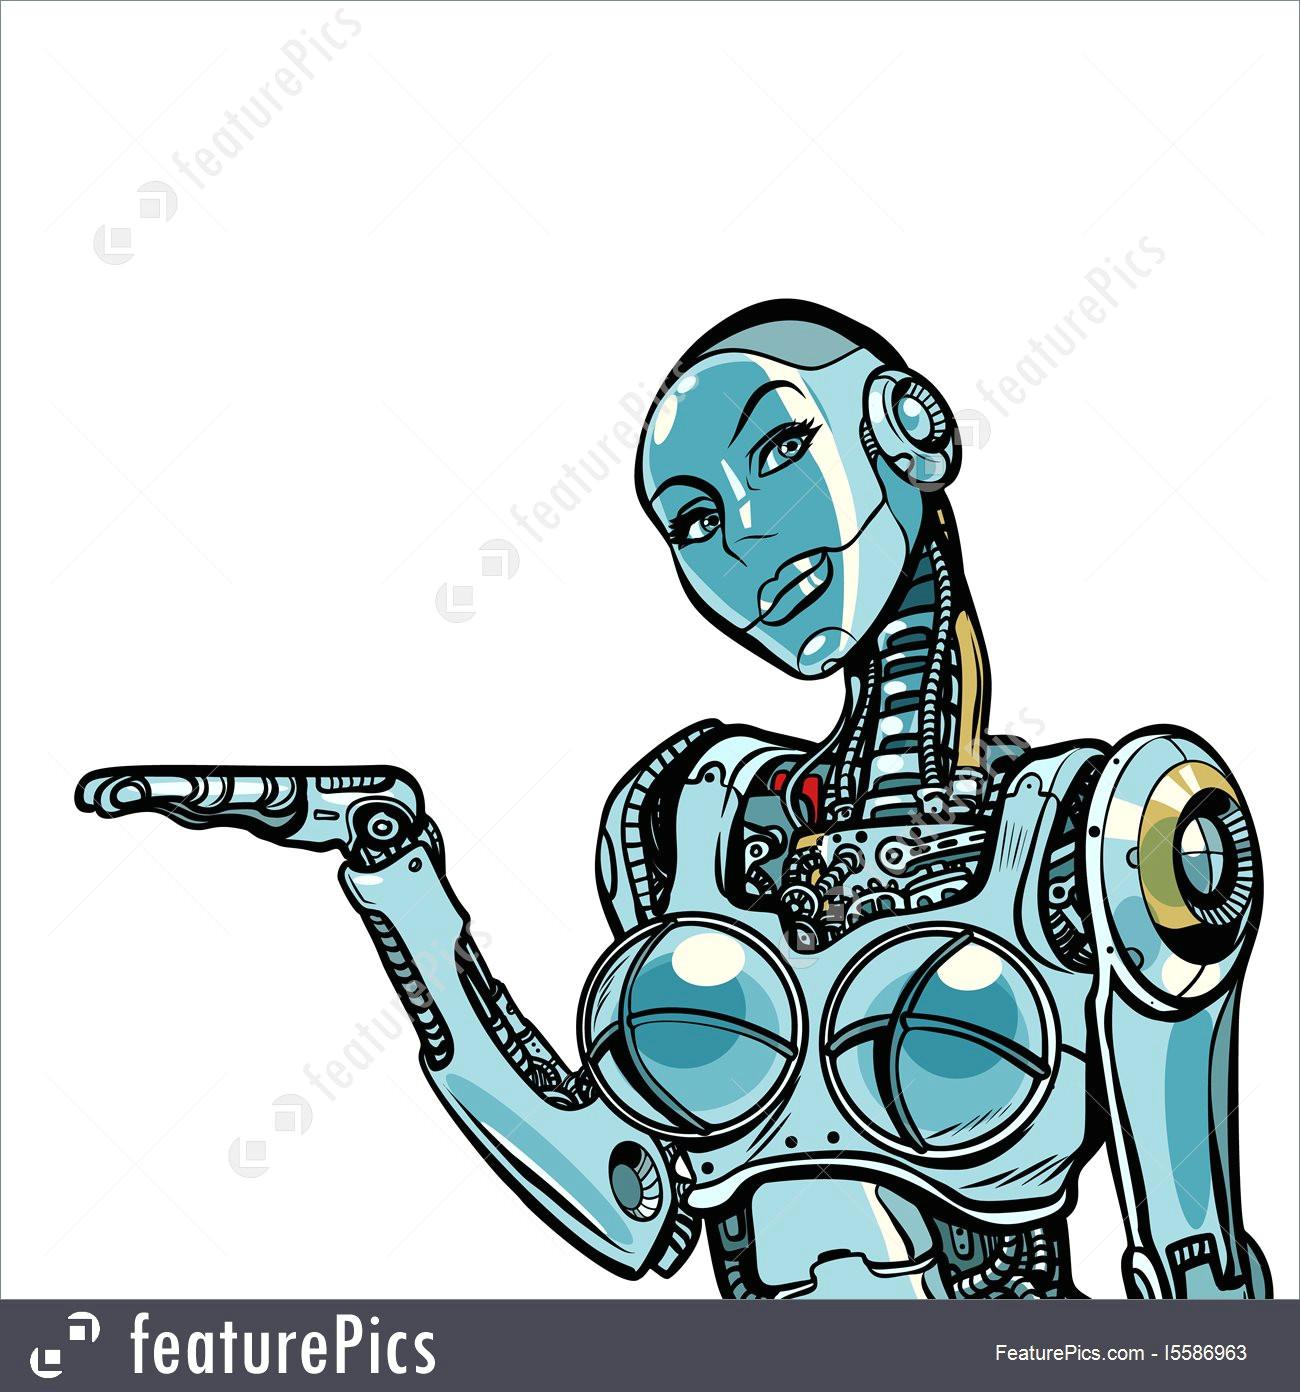 woman robot royalty free stock illustration